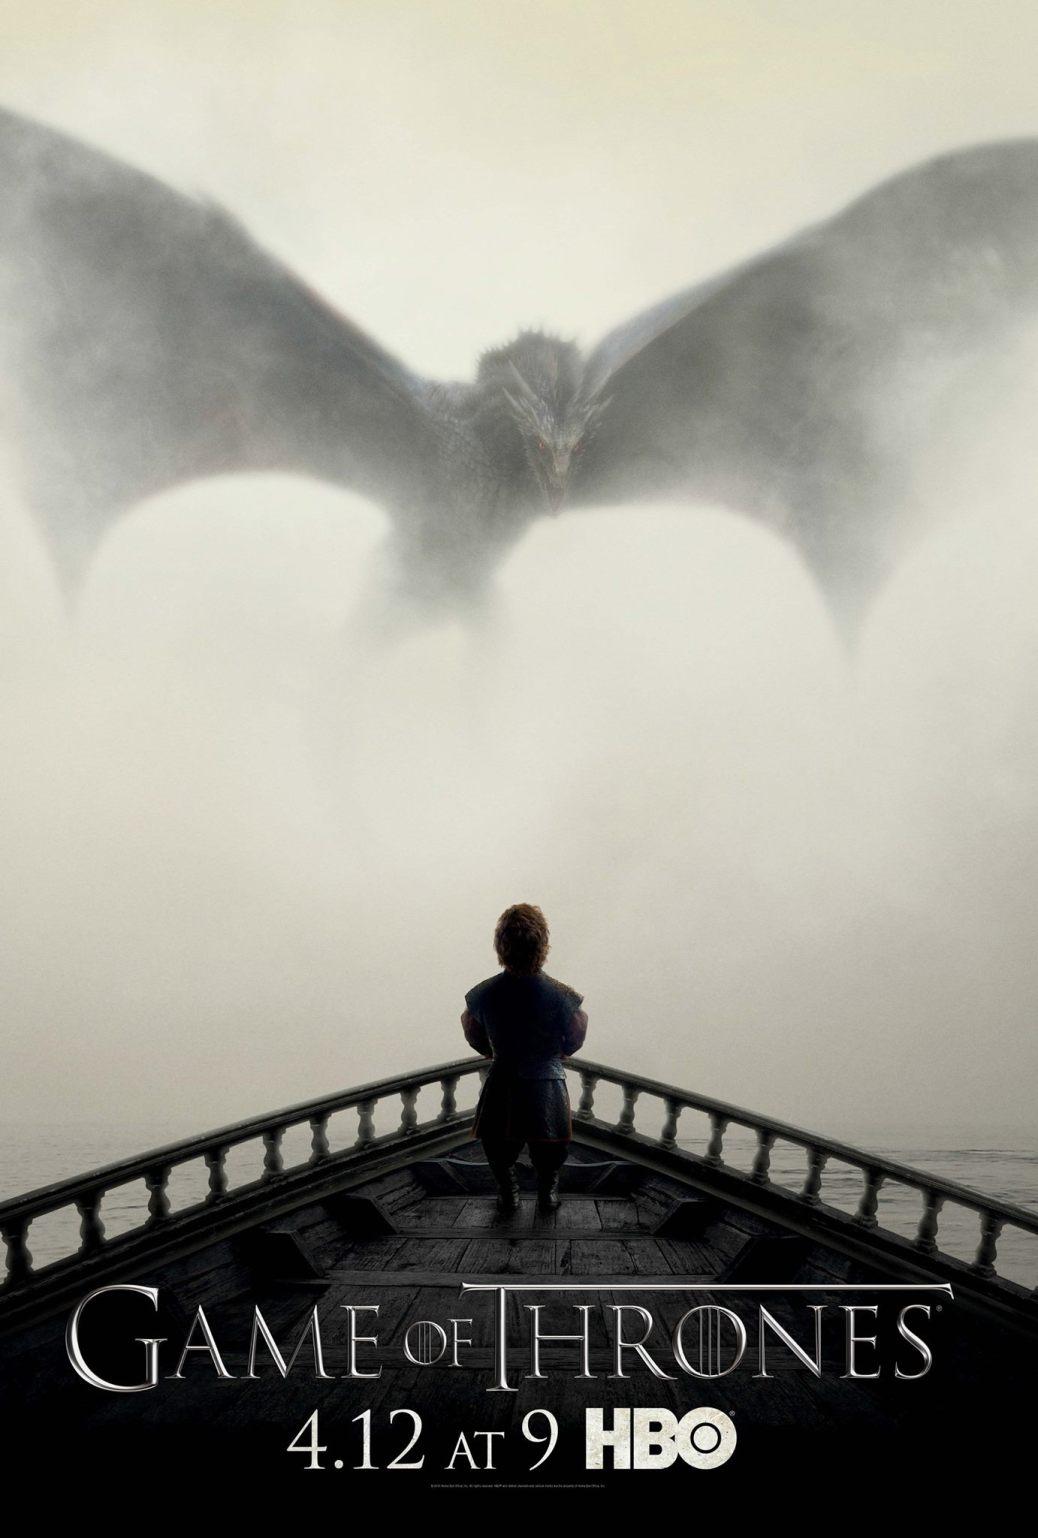 Drogon, Arya Stark, Game of Thrones, Game of Thrones Season 5